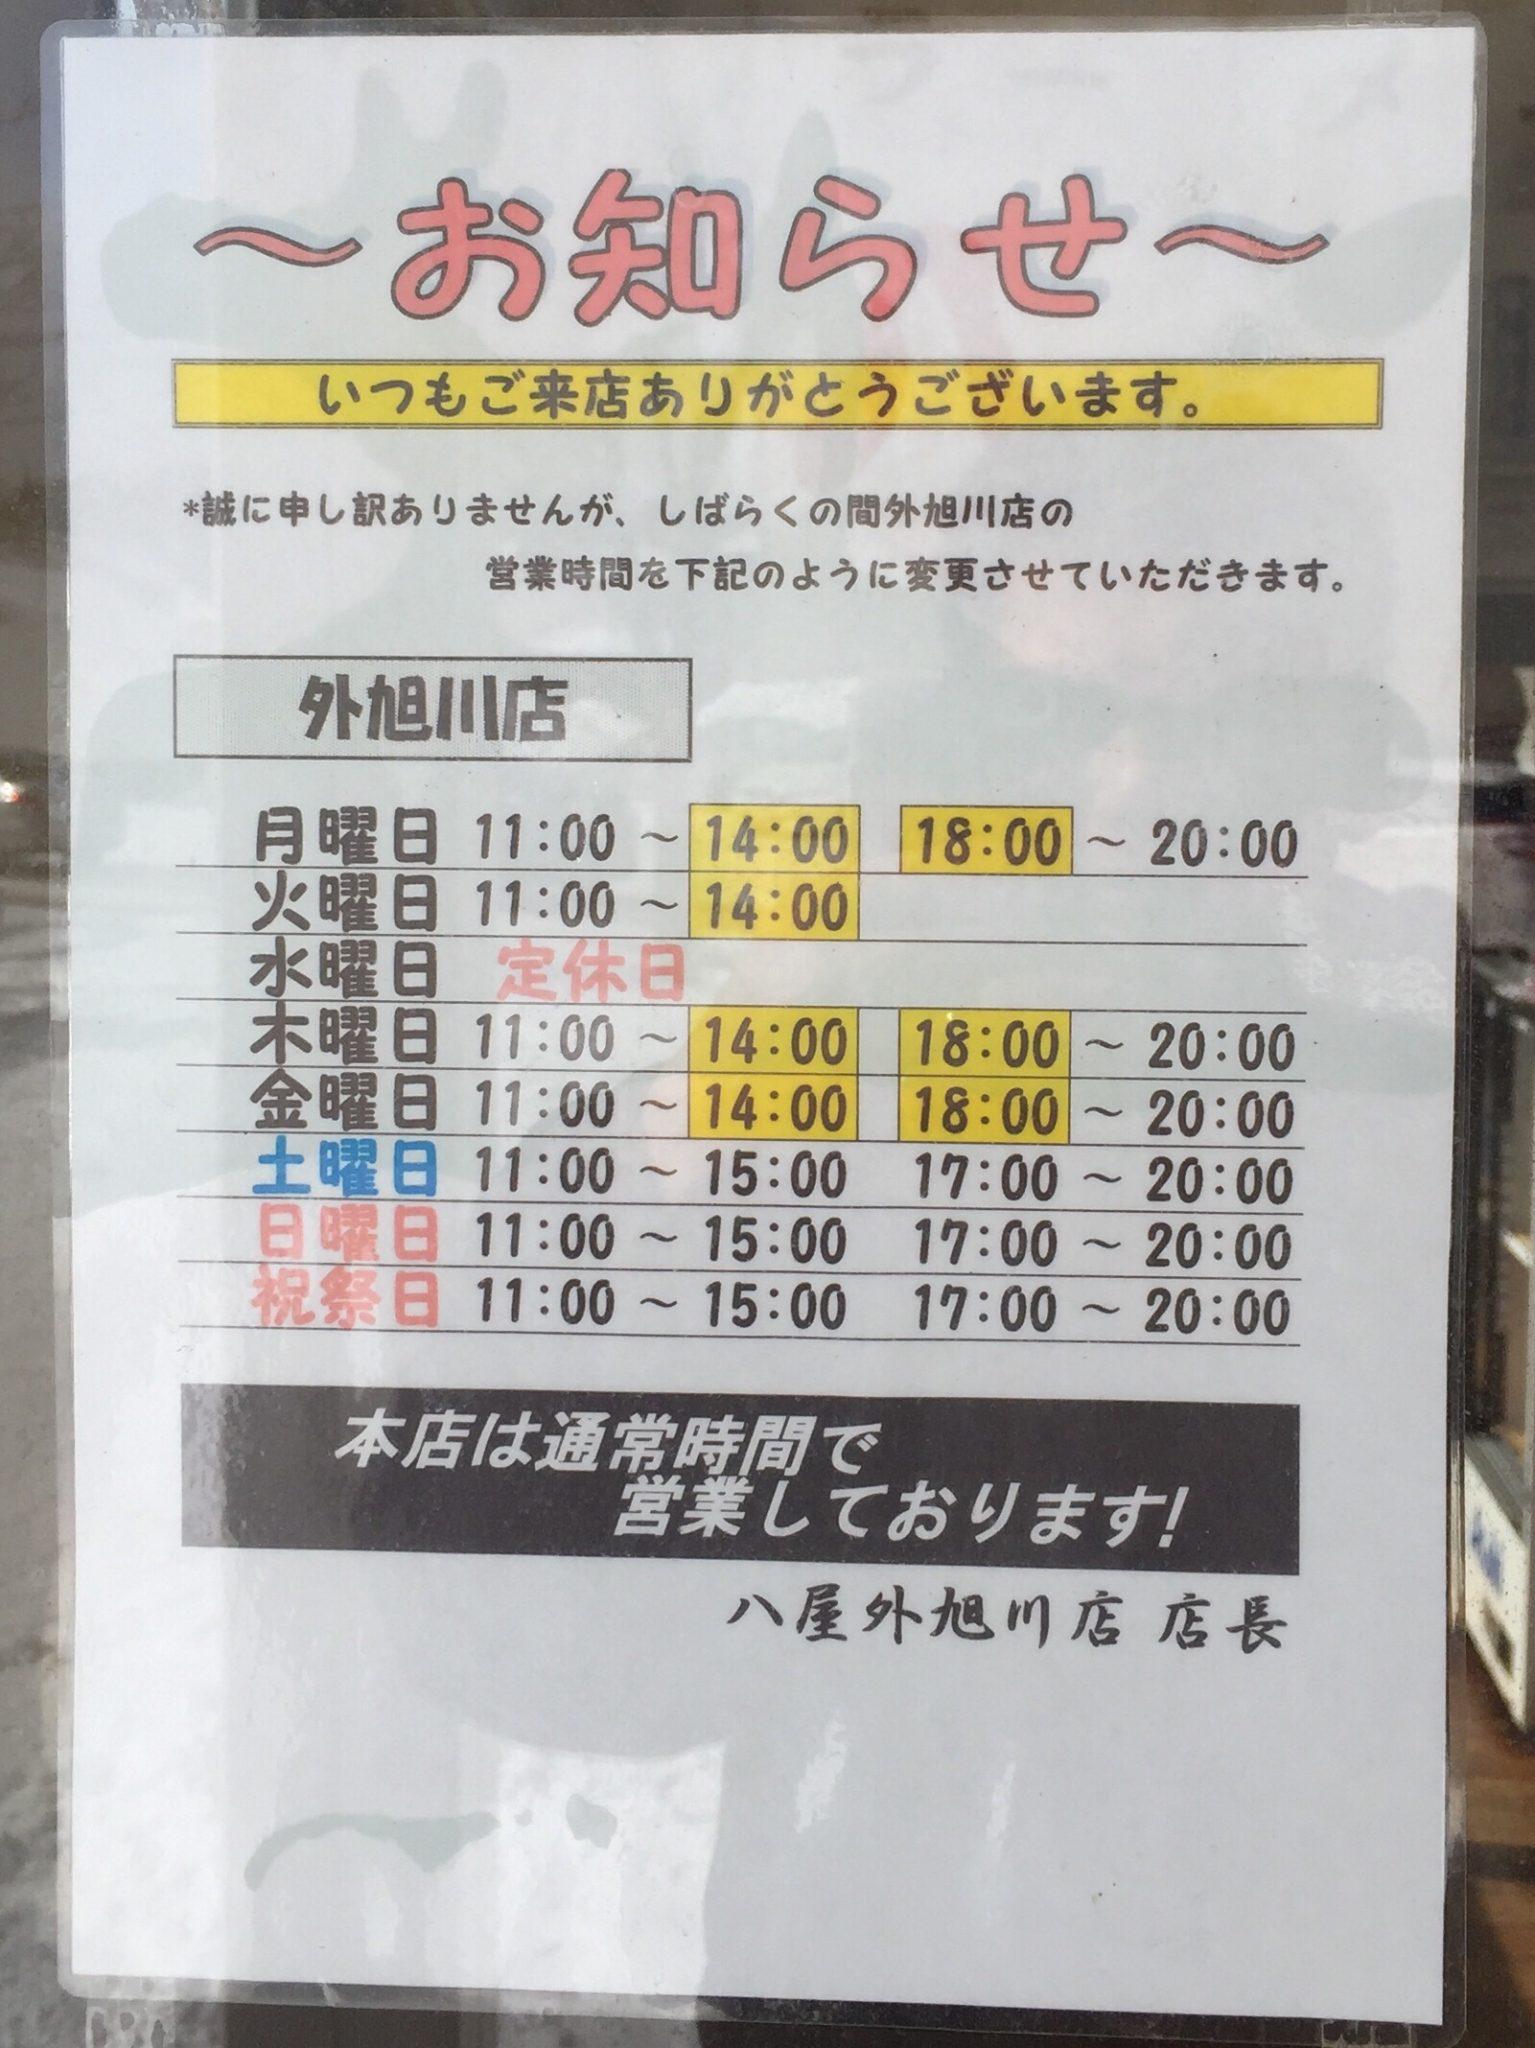 室蘭ラーメンの店 八屋 外旭川店 営業時間 営業案内 定休日